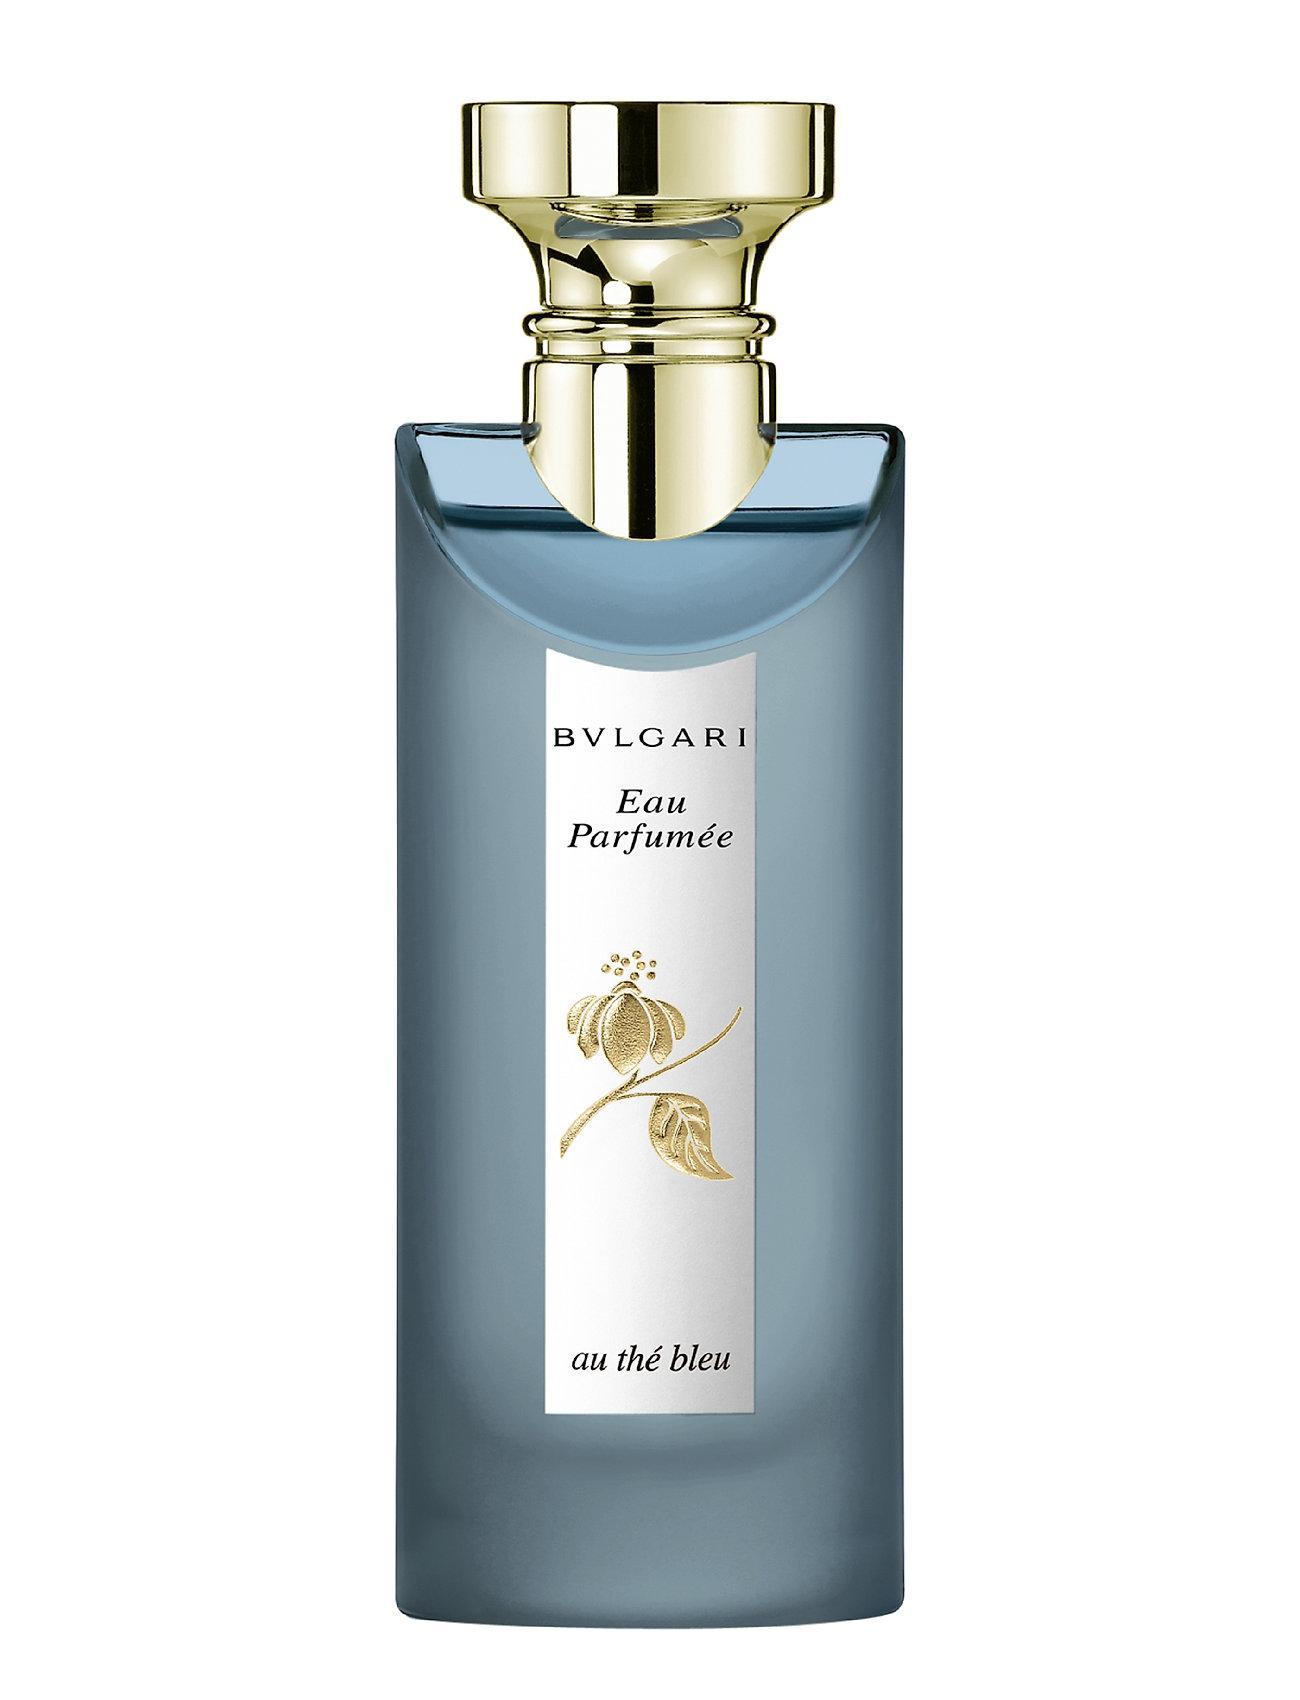 bvlgari – Eau parfumã© au thã© bleu 75 ml fra boozt.com dk